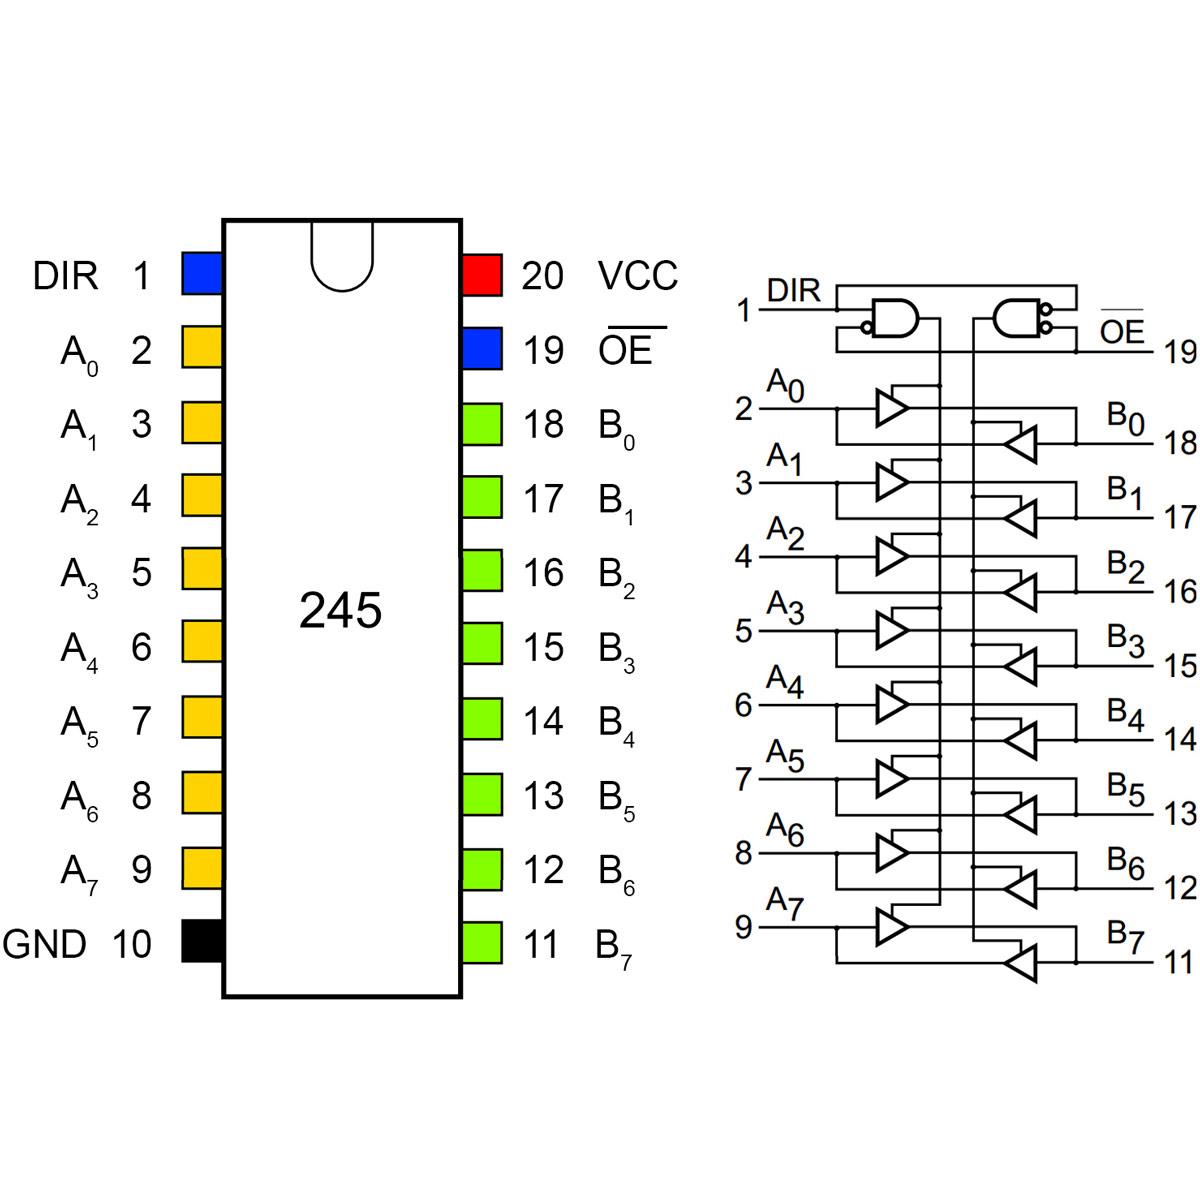 sn74lvc245a 8 bit logic level converter